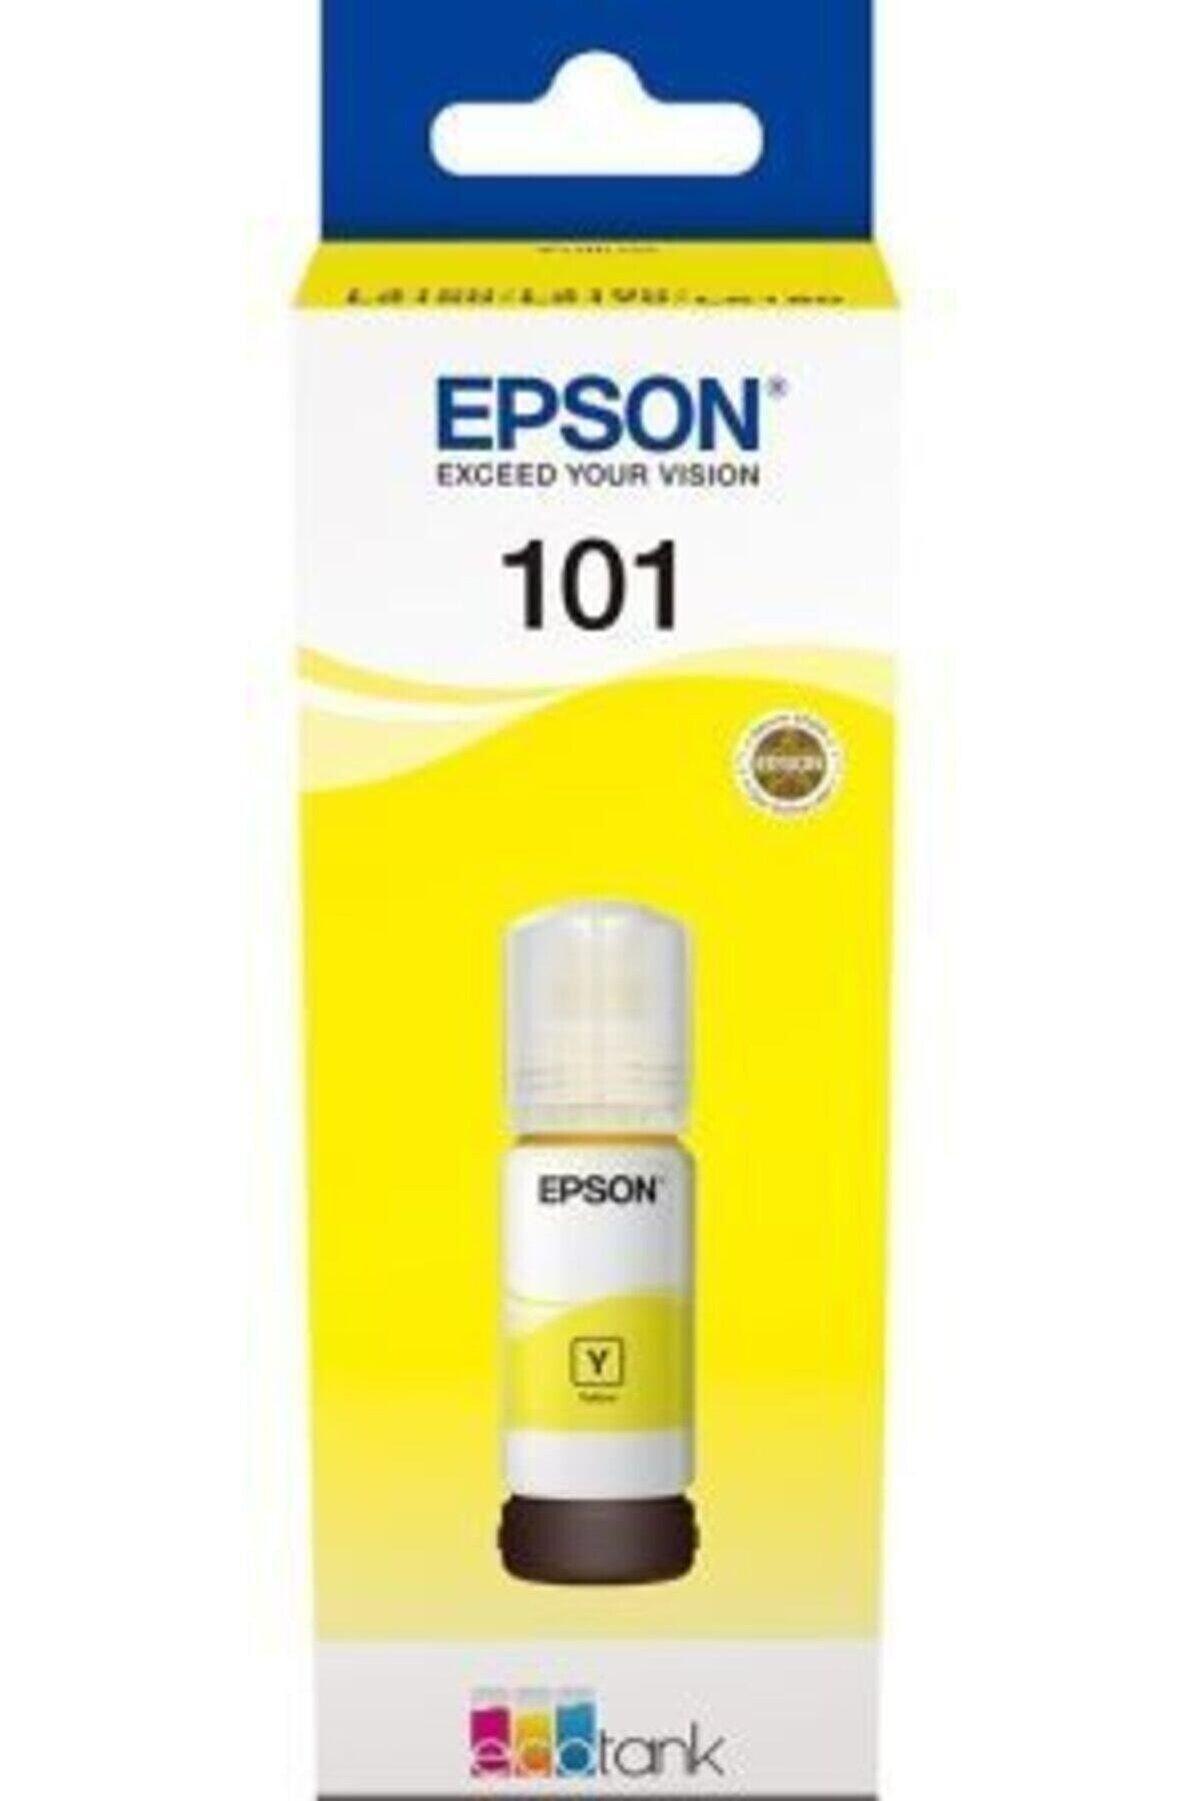 Epson 101 Sarı Orjinal Şişe Mürekkep Kartuş C13t03v44a